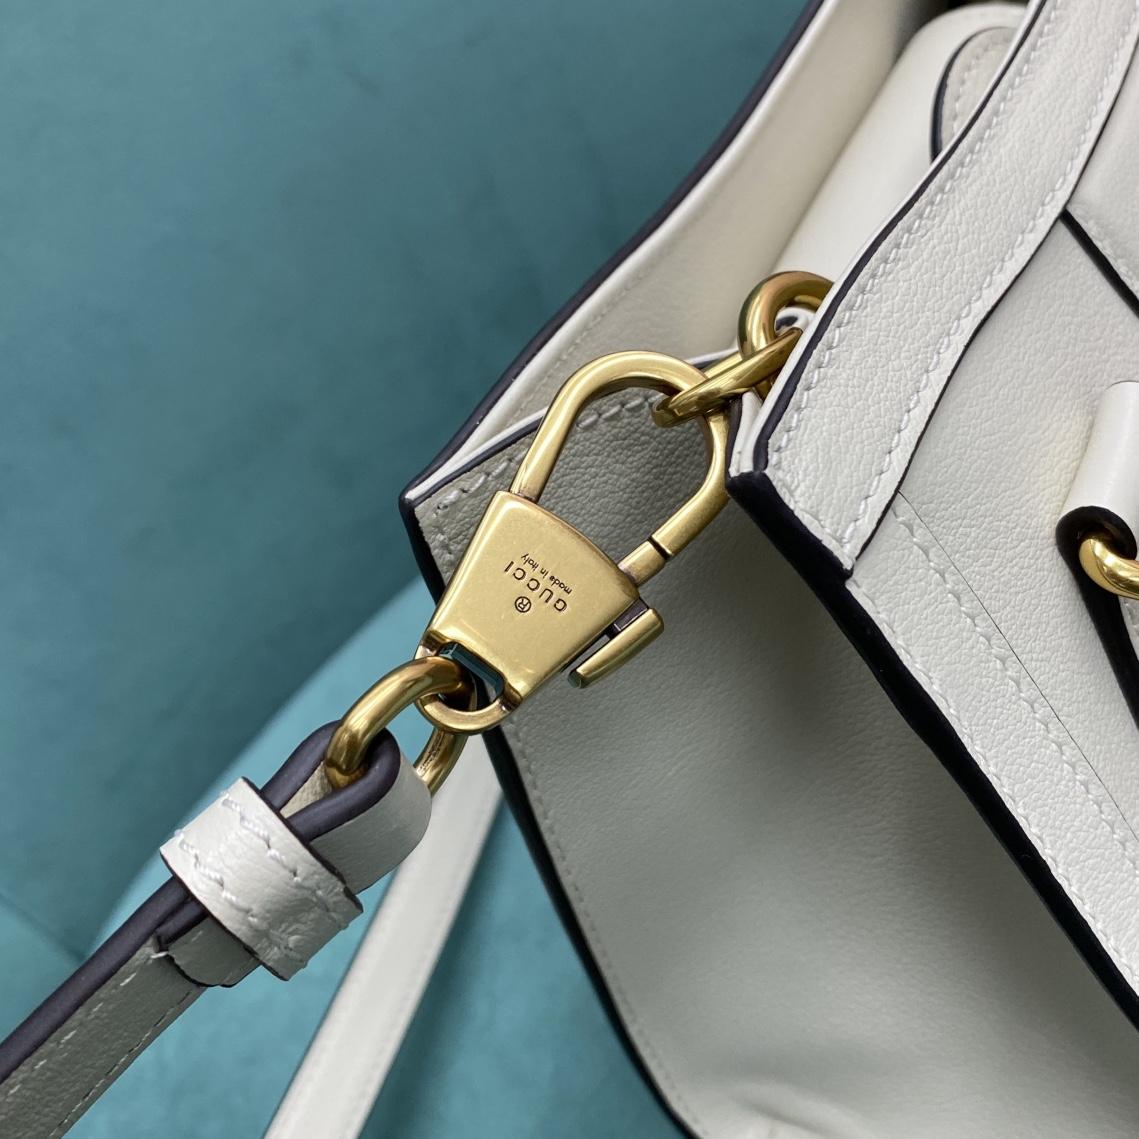 【P1280】古驰包包货源 Gucci Diana竹节包小号655661白色牛皮手提包20CM